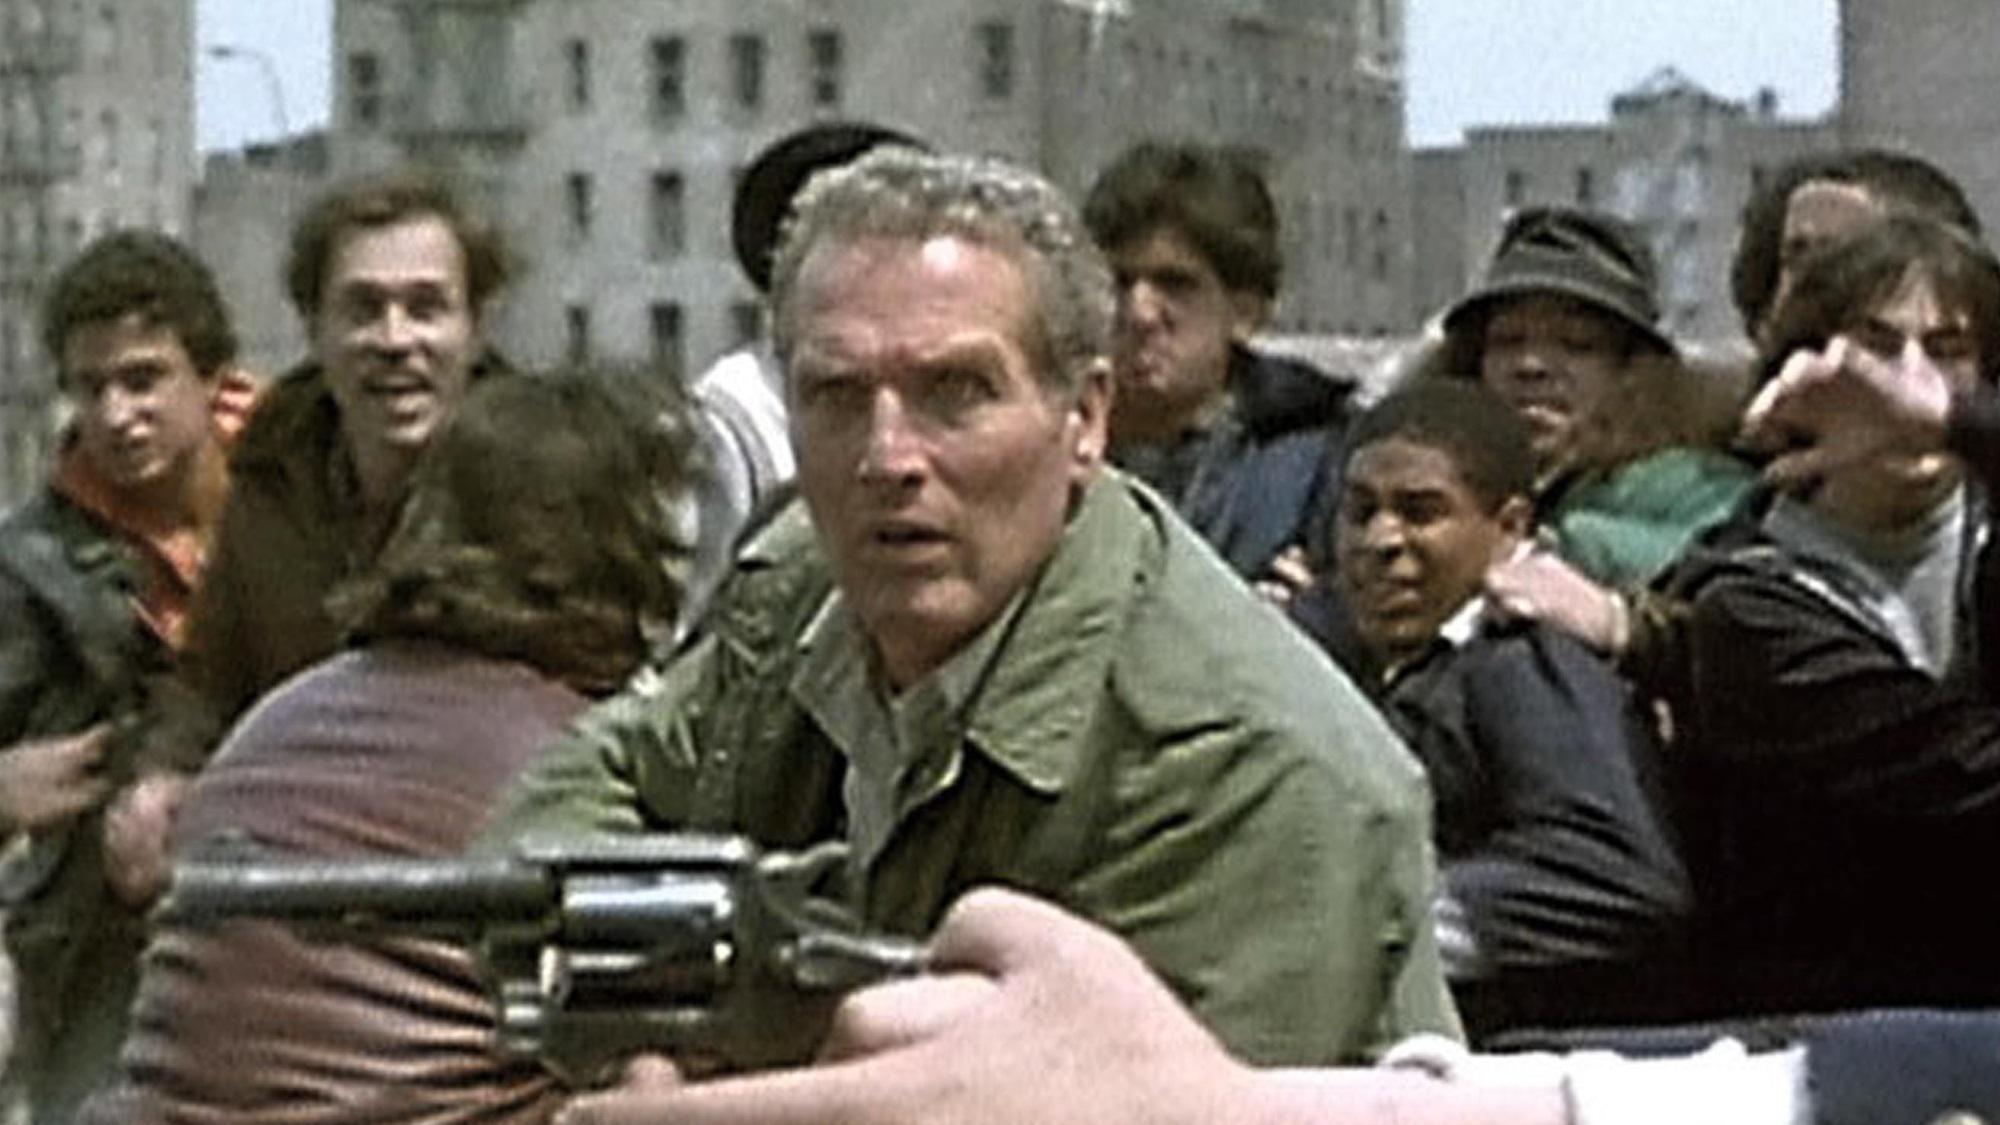 Le policier du Bronx